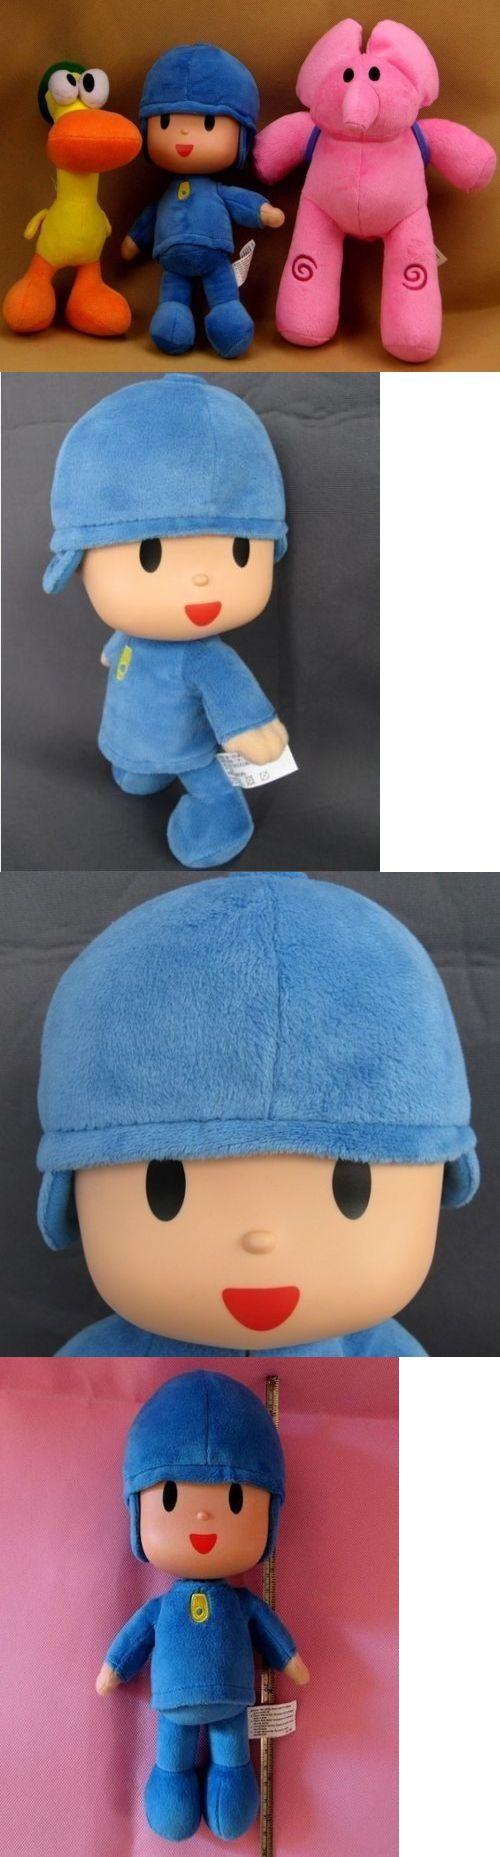 TV Movie and Character Toys 51031: 1Set 3Pcs Bandai Plush Pocoyo Elly Pato Soft Plush Dolls Stuffed Figure Toy Doll -> BUY IT NOW ONLY: $38 on eBay!